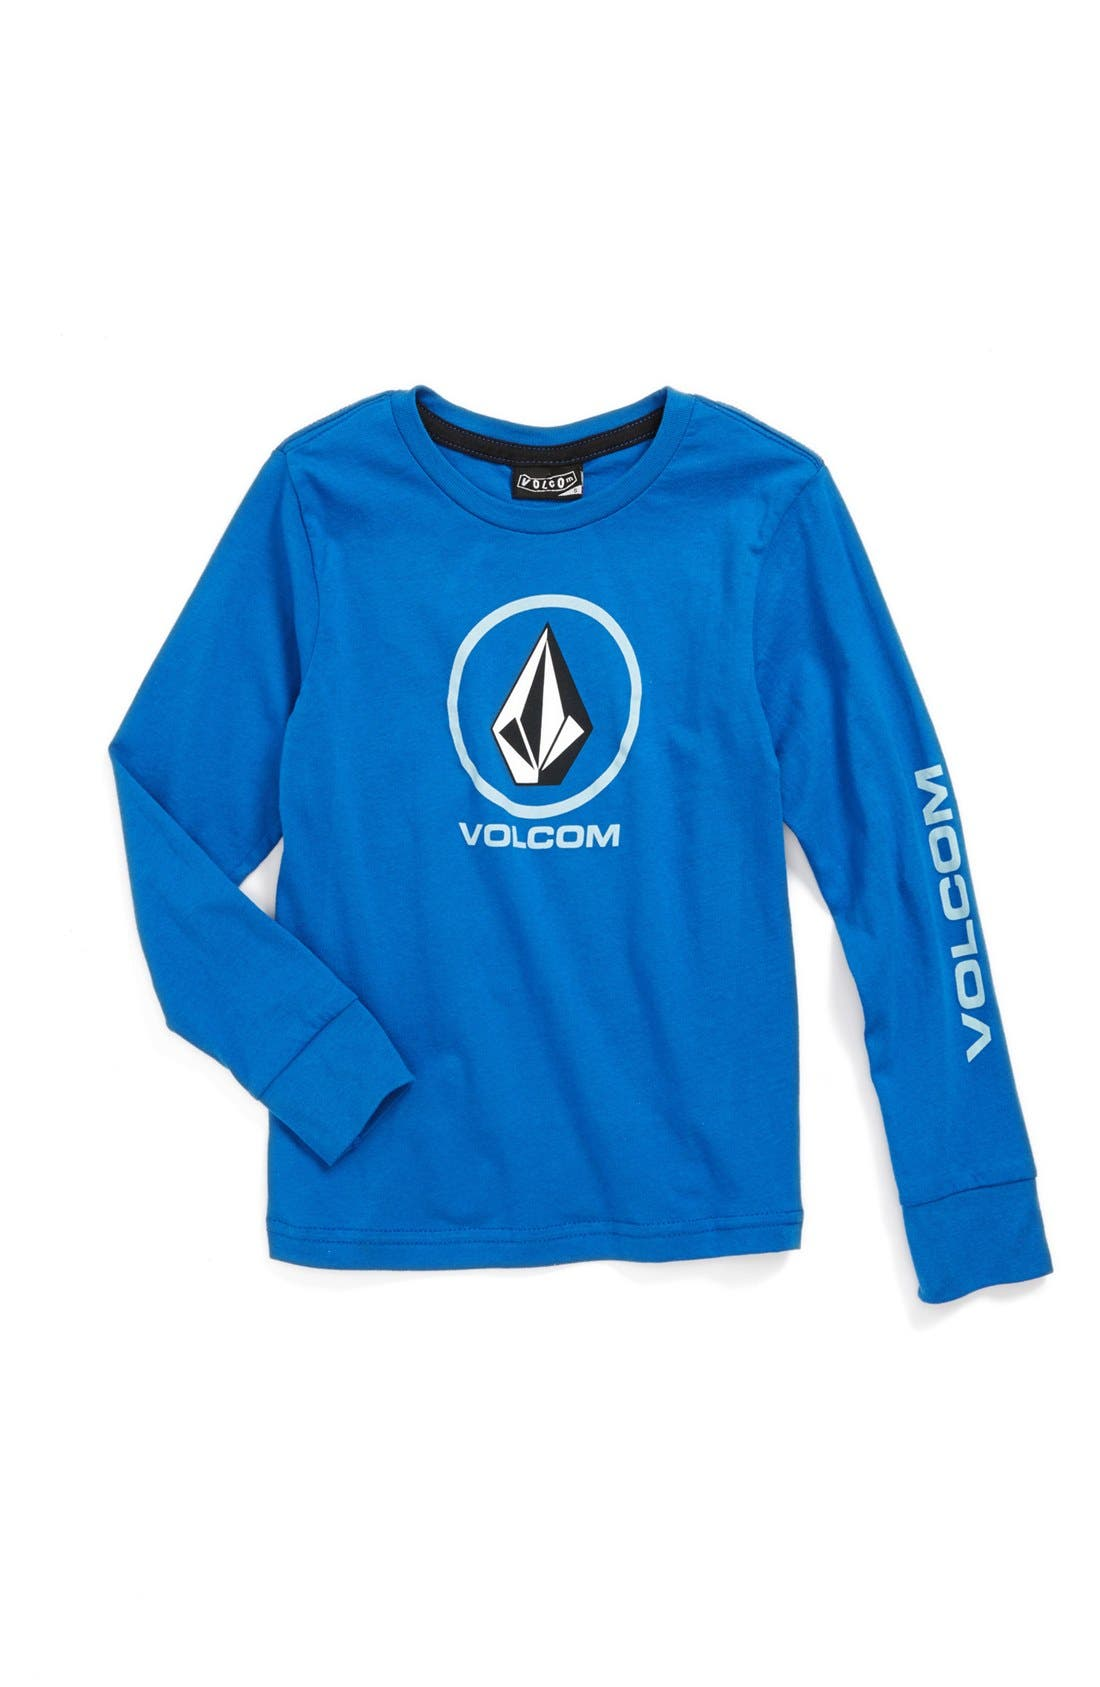 Main Image - Volcom 'Circle Staple' Long Sleeve T-Shirt (Big Boys)